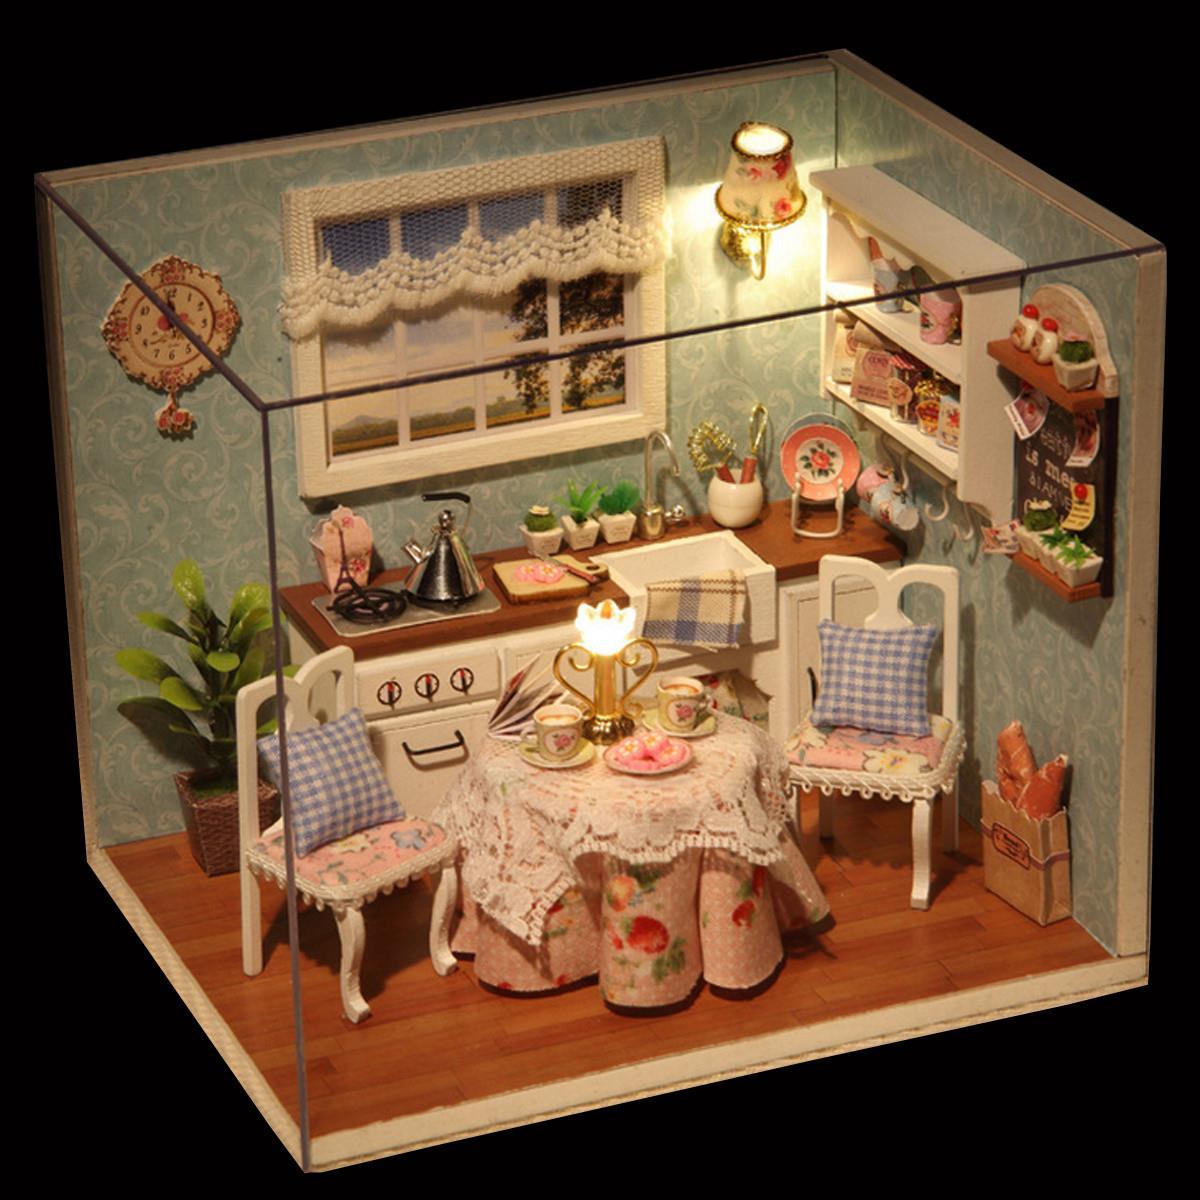 Aliexpresscom  Buy Diy Wooden Doll House Toys Dollhouse